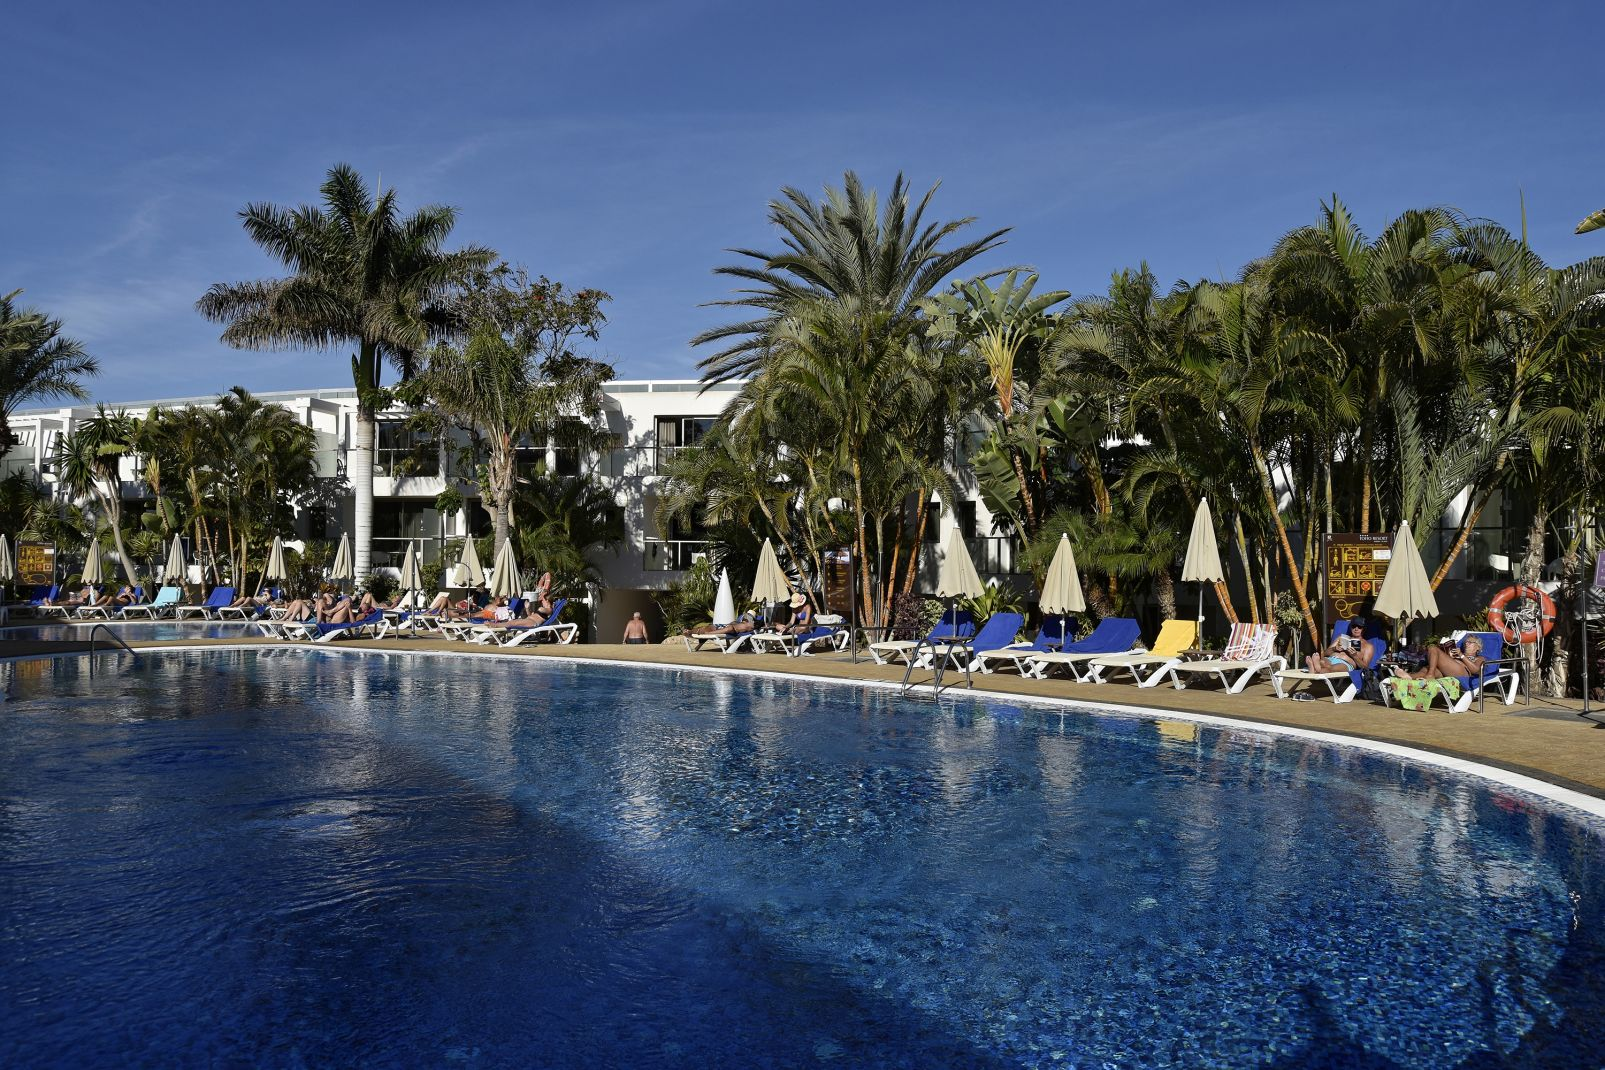 R2 Romantic Fantasia Dream Hotel & SPA 4* Fuerteventura - Tarajalejo - 1